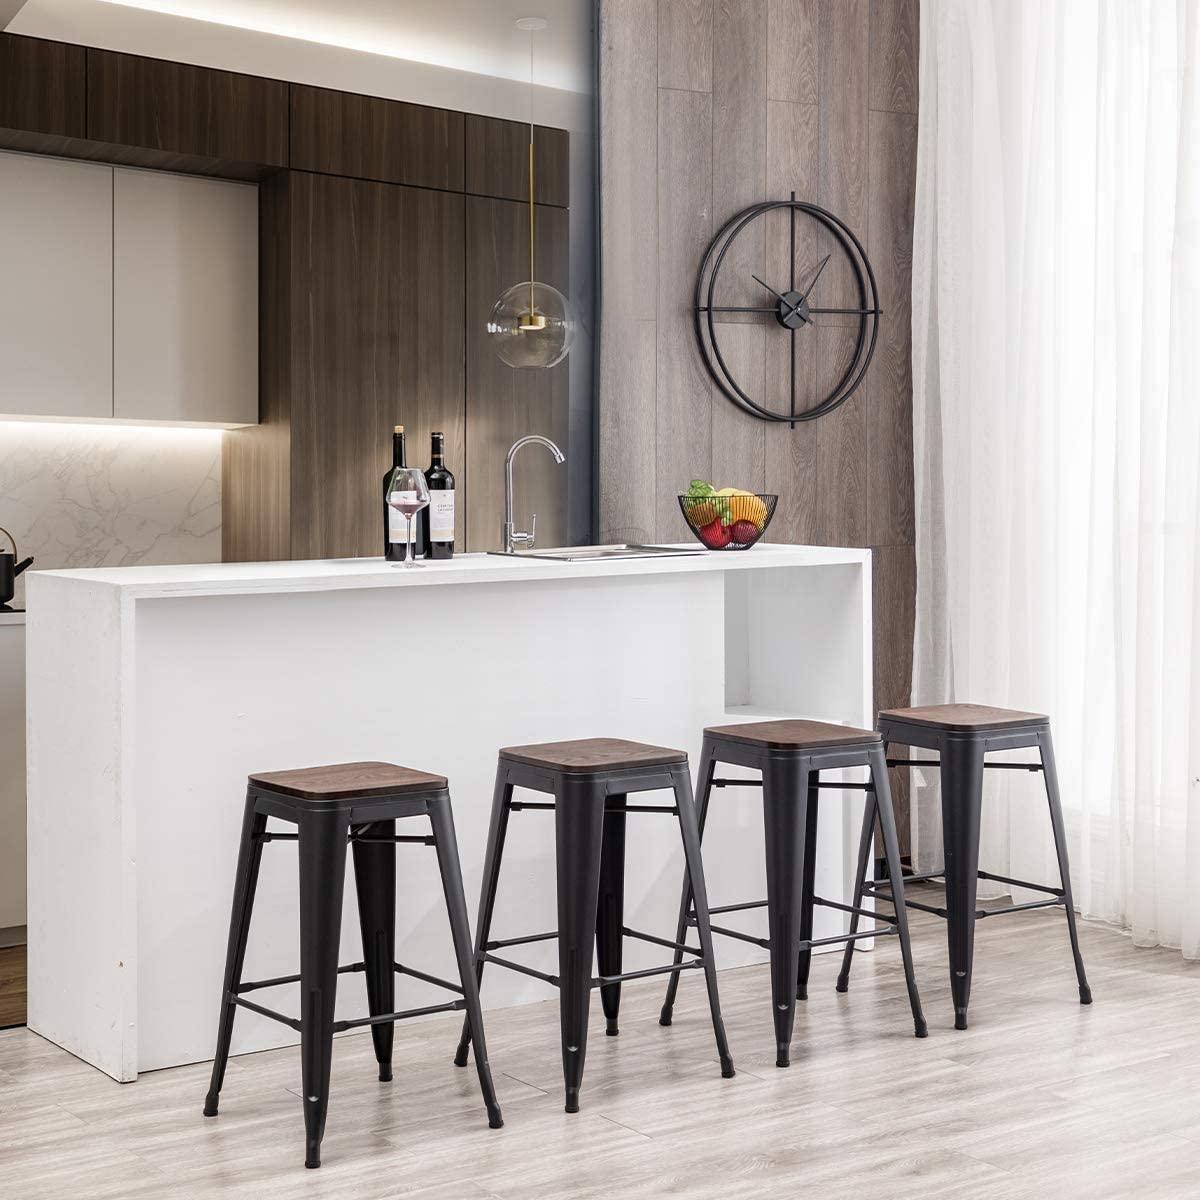 Sharing #beautiful #barstools for #home #kitchen  #Amazon👉https://t.co/dAABUSHViB……… #metalfurnitures #metalchair #interiordesign #moderndesign #decorationideas #blog #furniture #industrial #bar #chair #MondayThoughts #MonMotivation #MondayWisdom #Mondaymorning https://t.co/Ov8FXDNRop